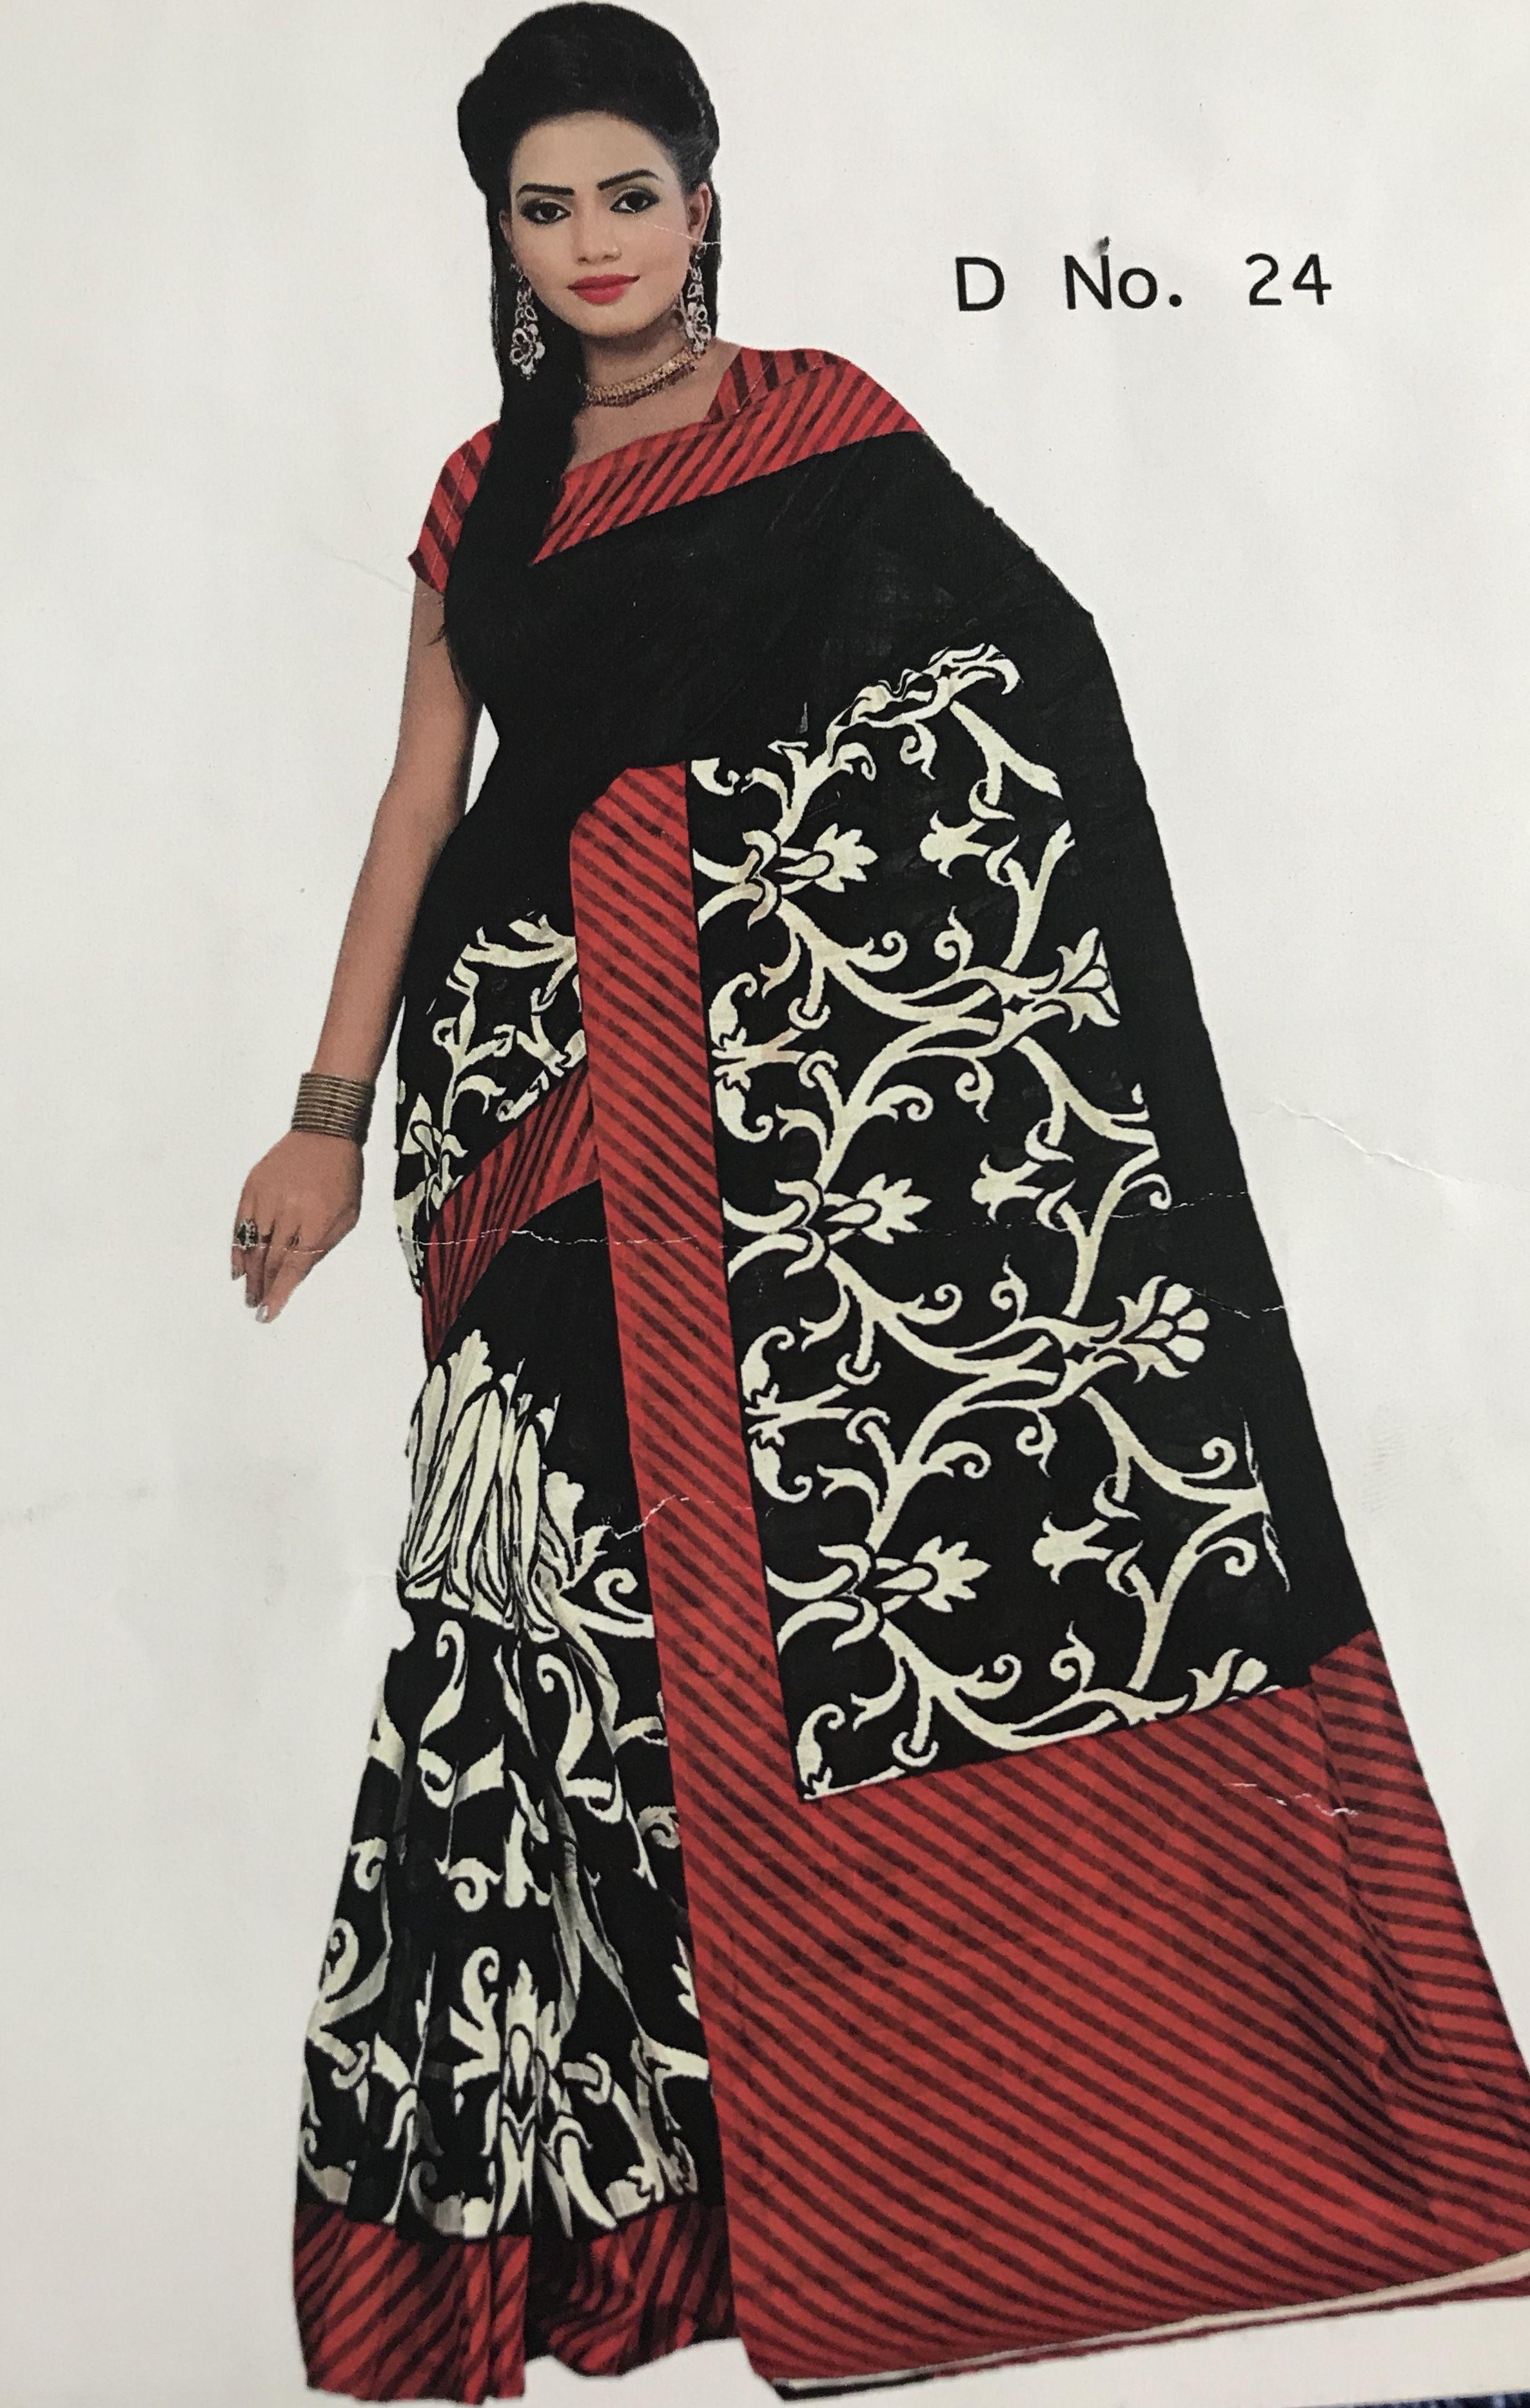 Printed Art Matka Silk Saree in Black, White and Red Art